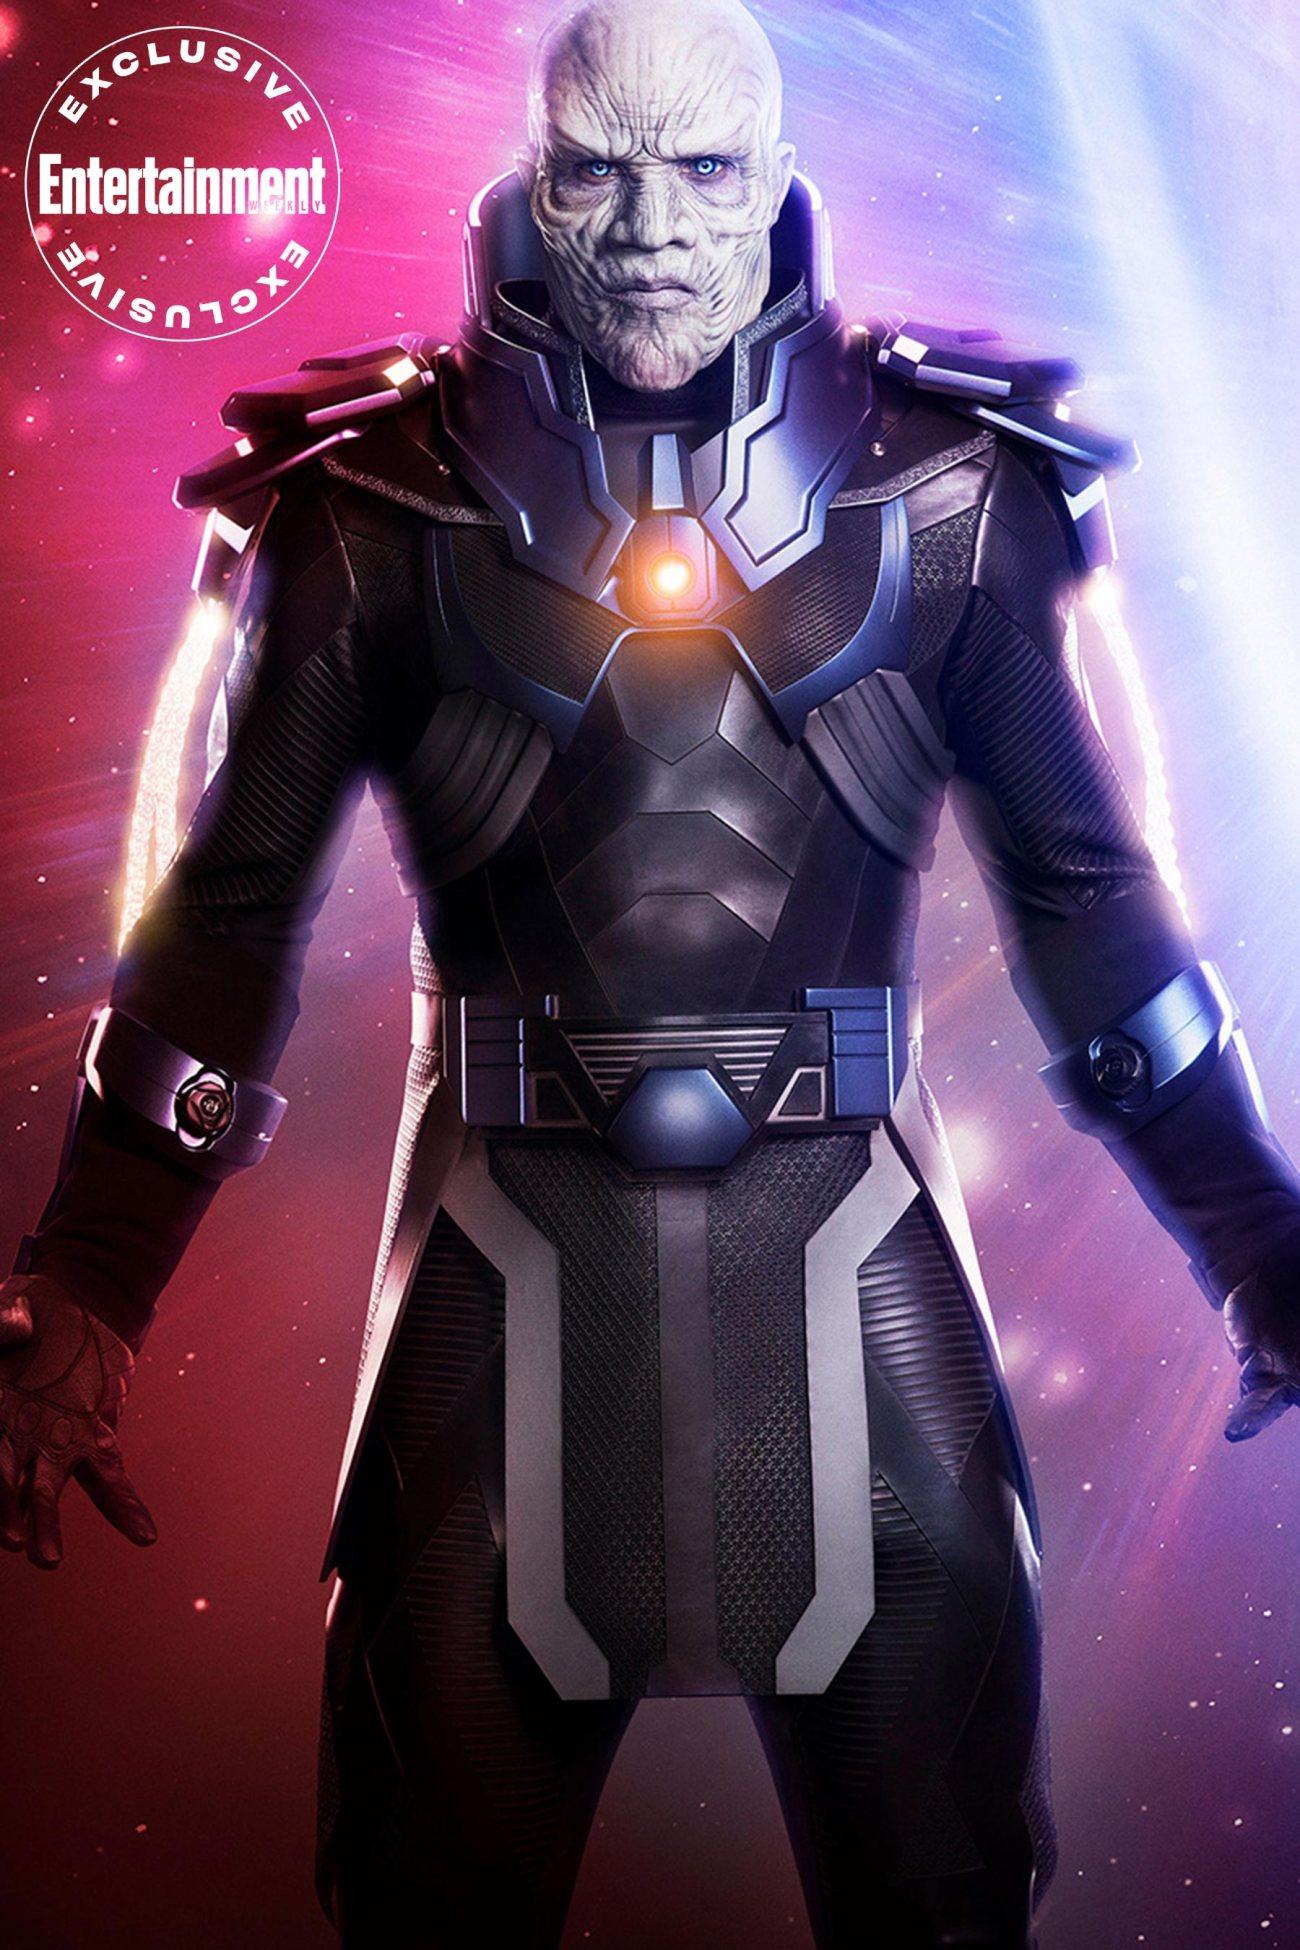 LaMonica Garrett como el Anti-Monitor en Crisis on Infinite Earths. Imagen: Jordan Nuttall/The CW/Entertainment Weekly